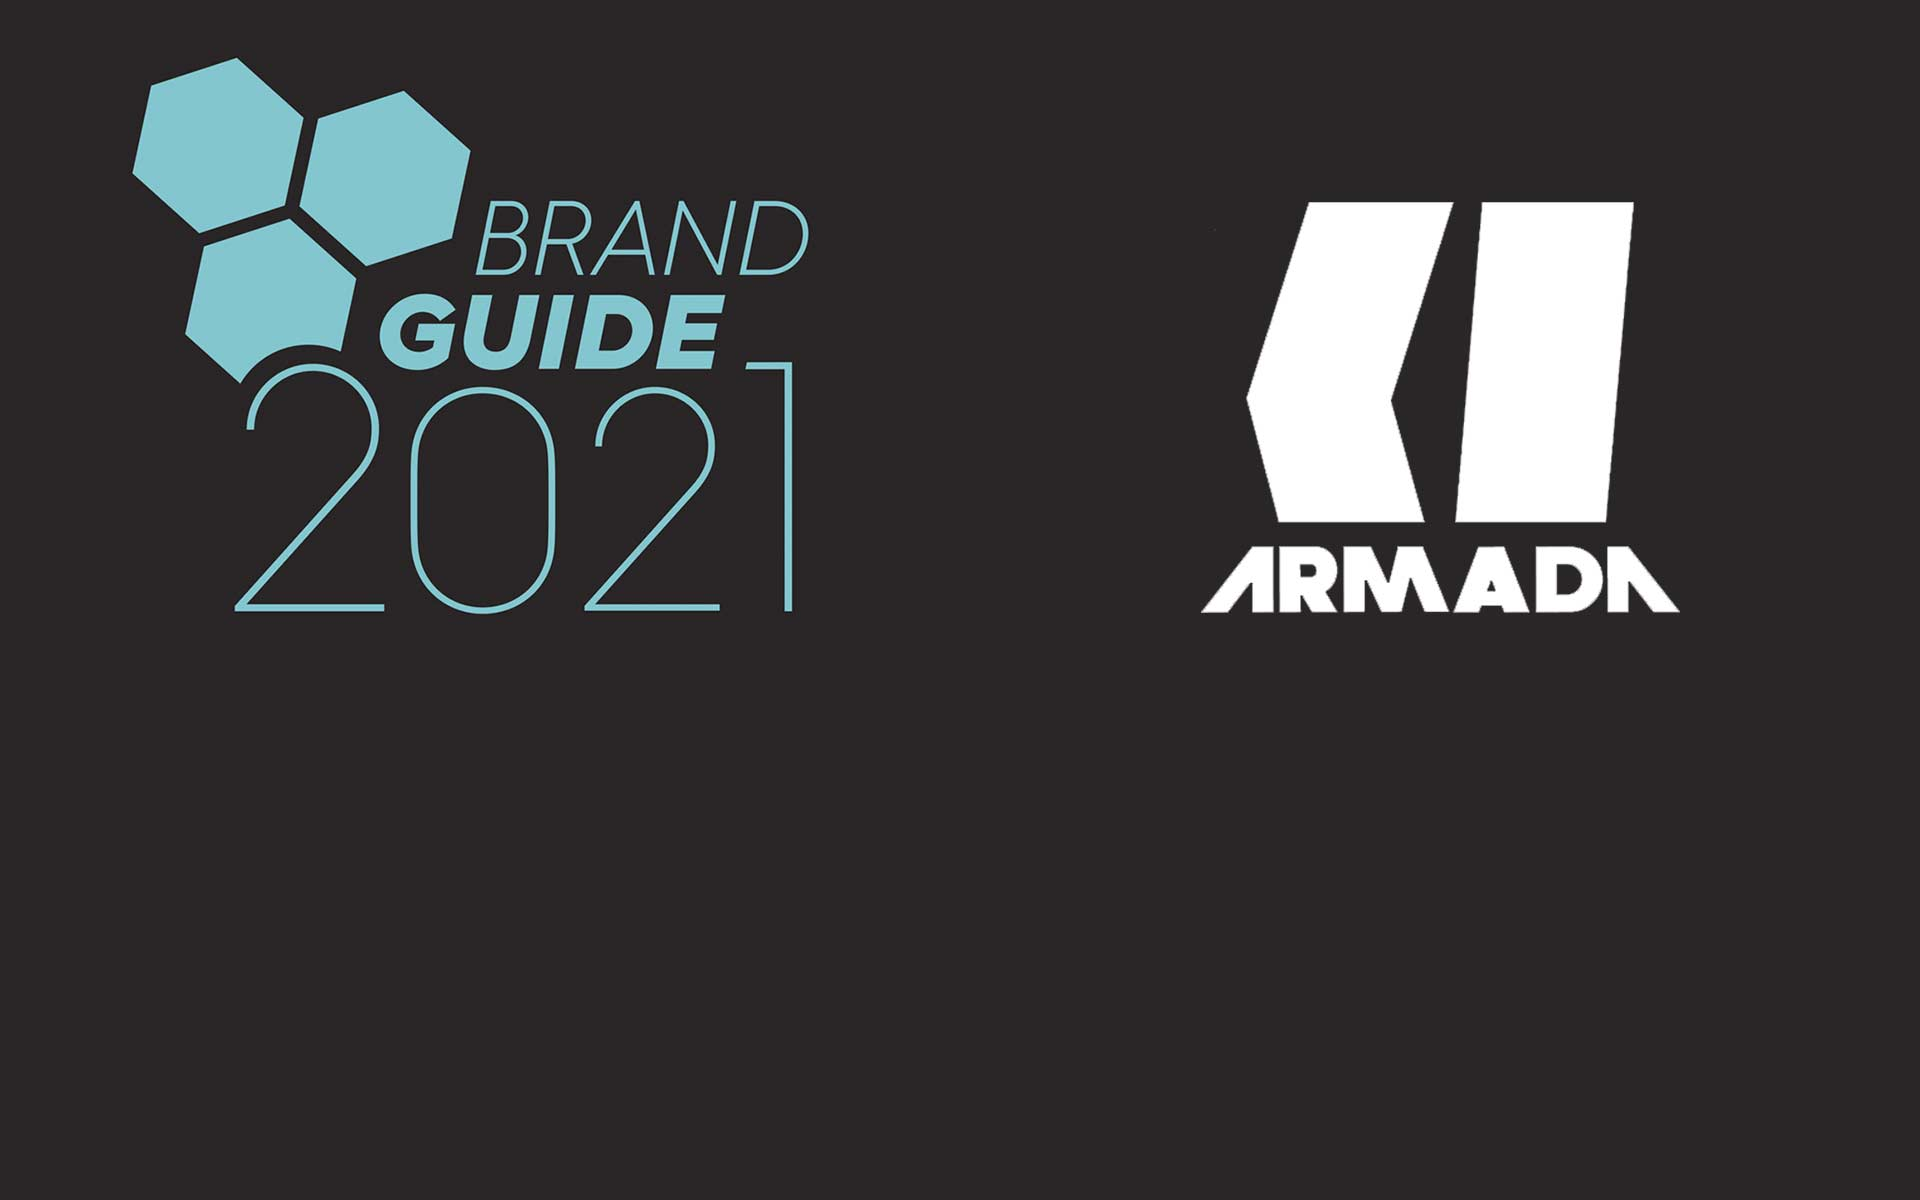 Armada Skis: Neue Zero-Modelle aus dem Innovationslabor (2021)